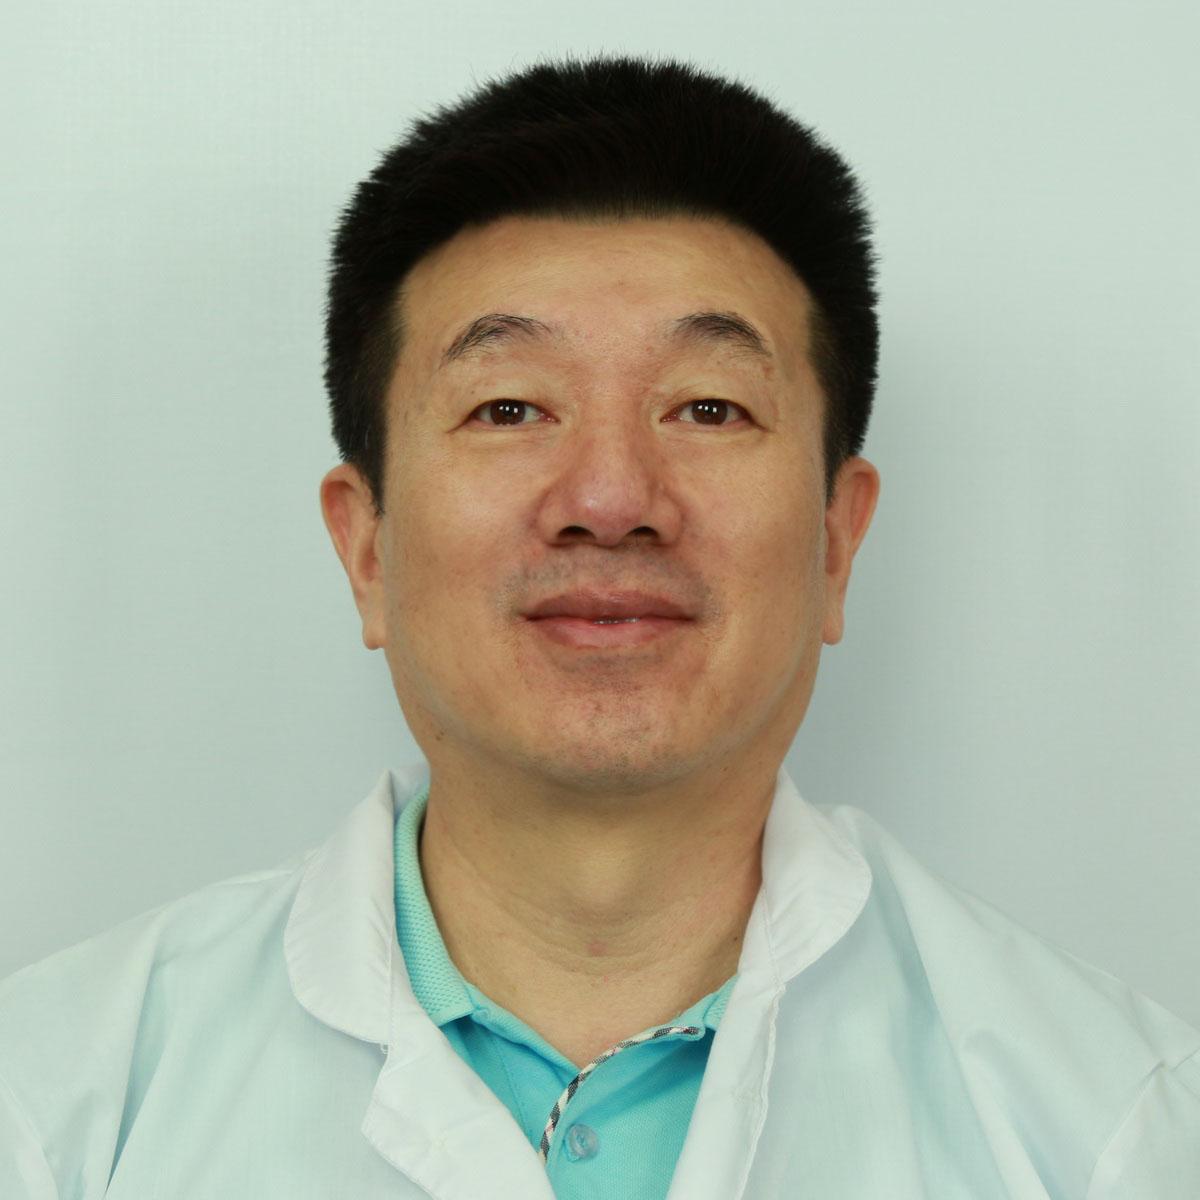 Сун-Лицян